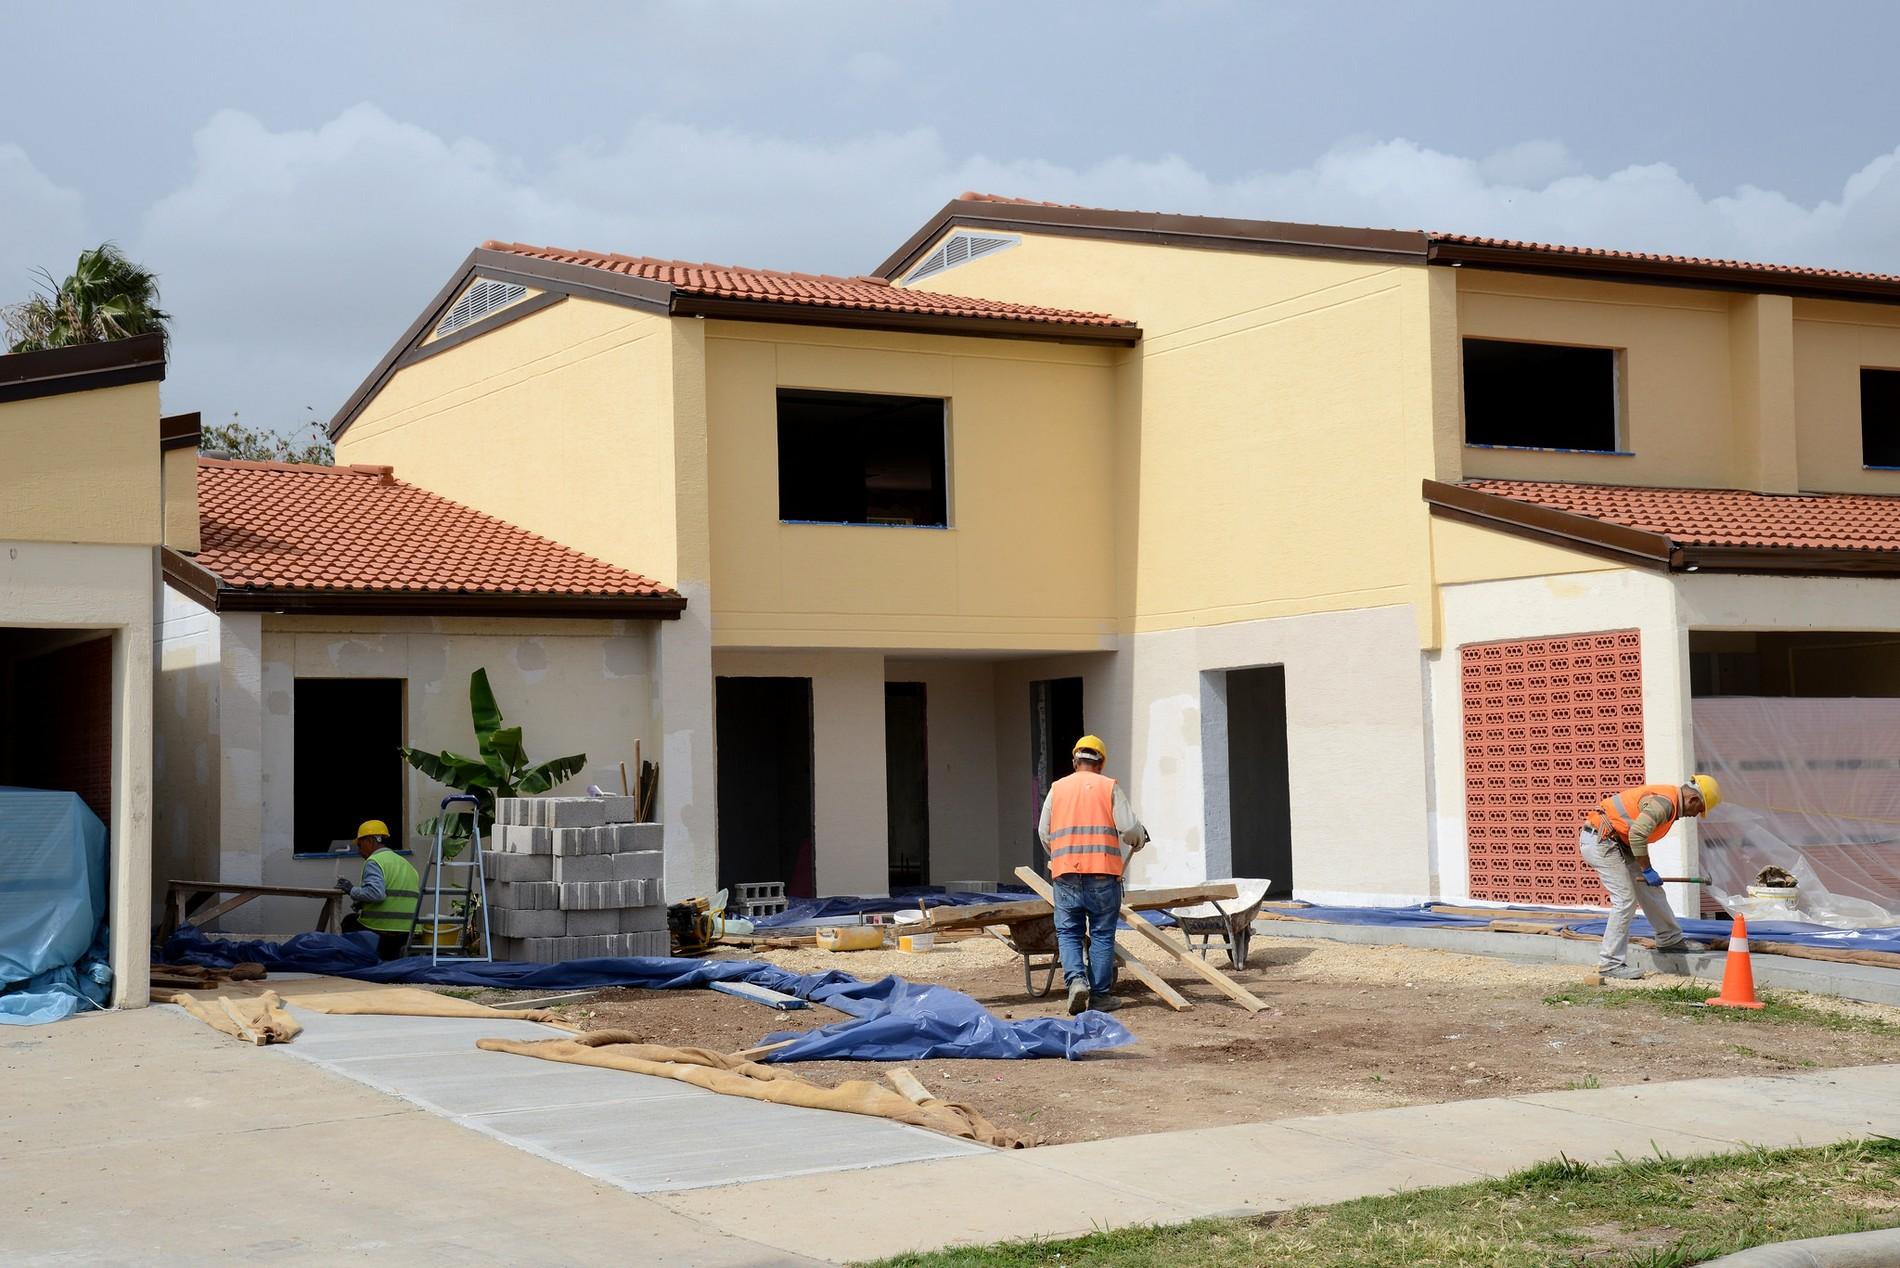 Faire construire sa maison avantage inconvenient maison for Construire sa maison contemporaine